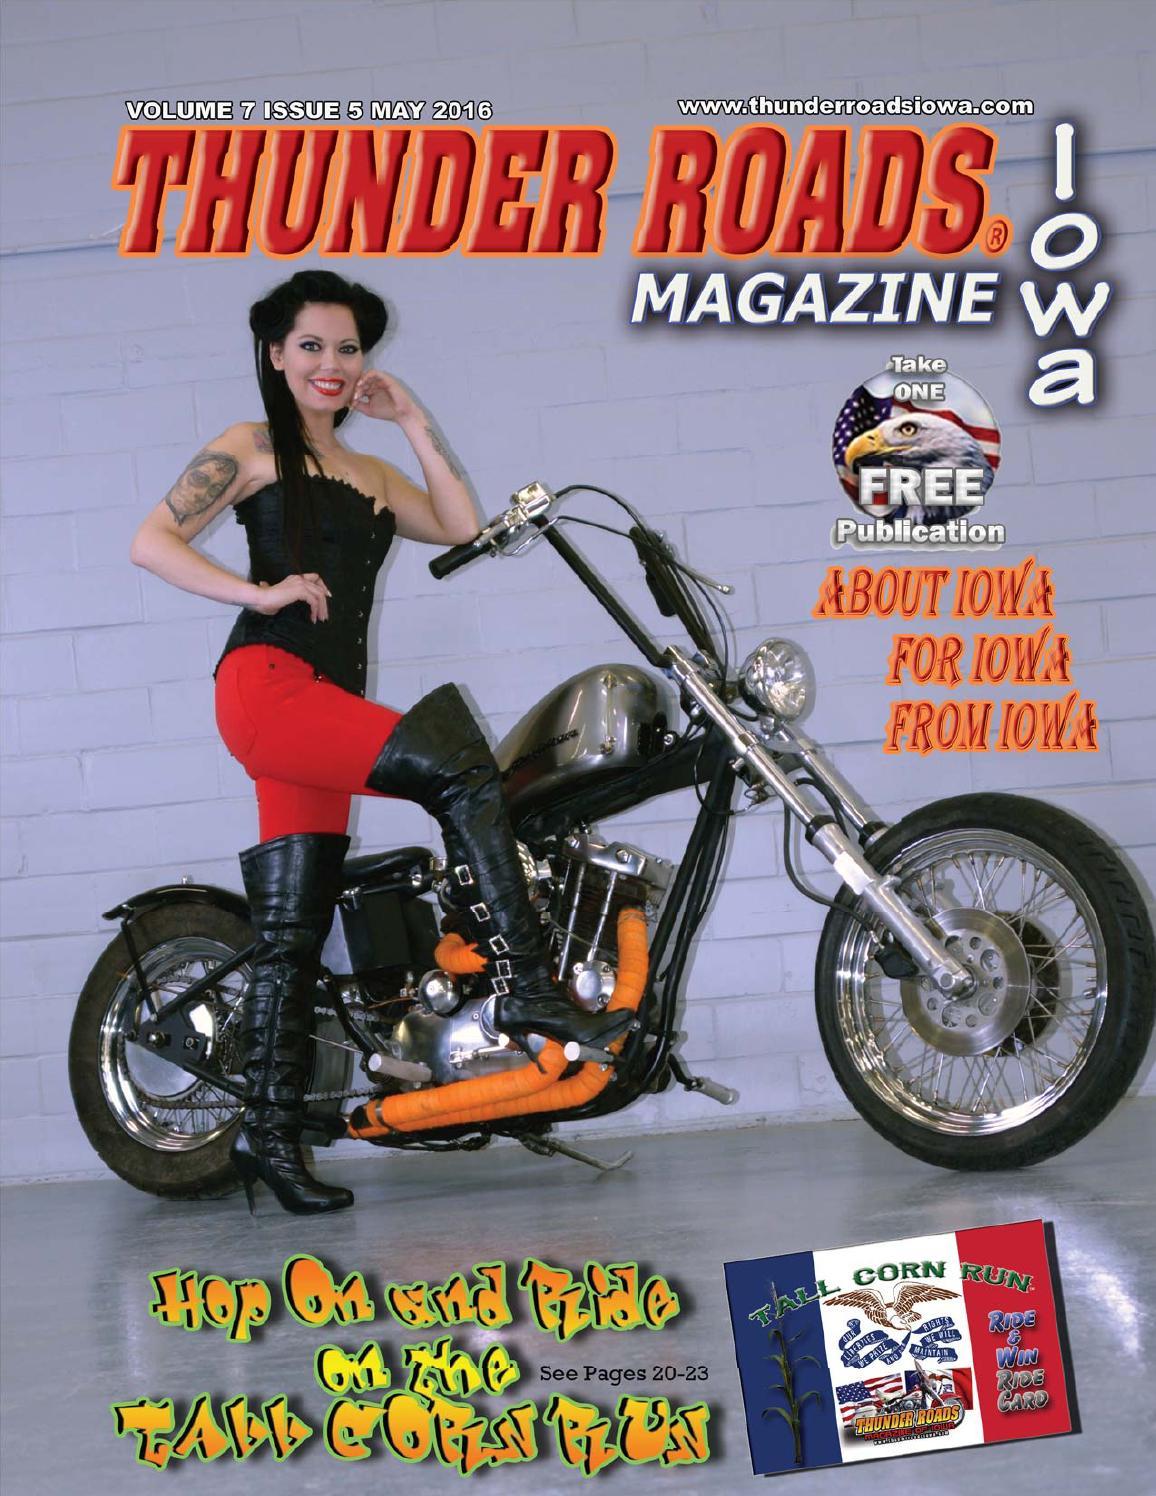 Thunder Roads Magazine Of Iowa May 2016 By Thunder Roads Magazine